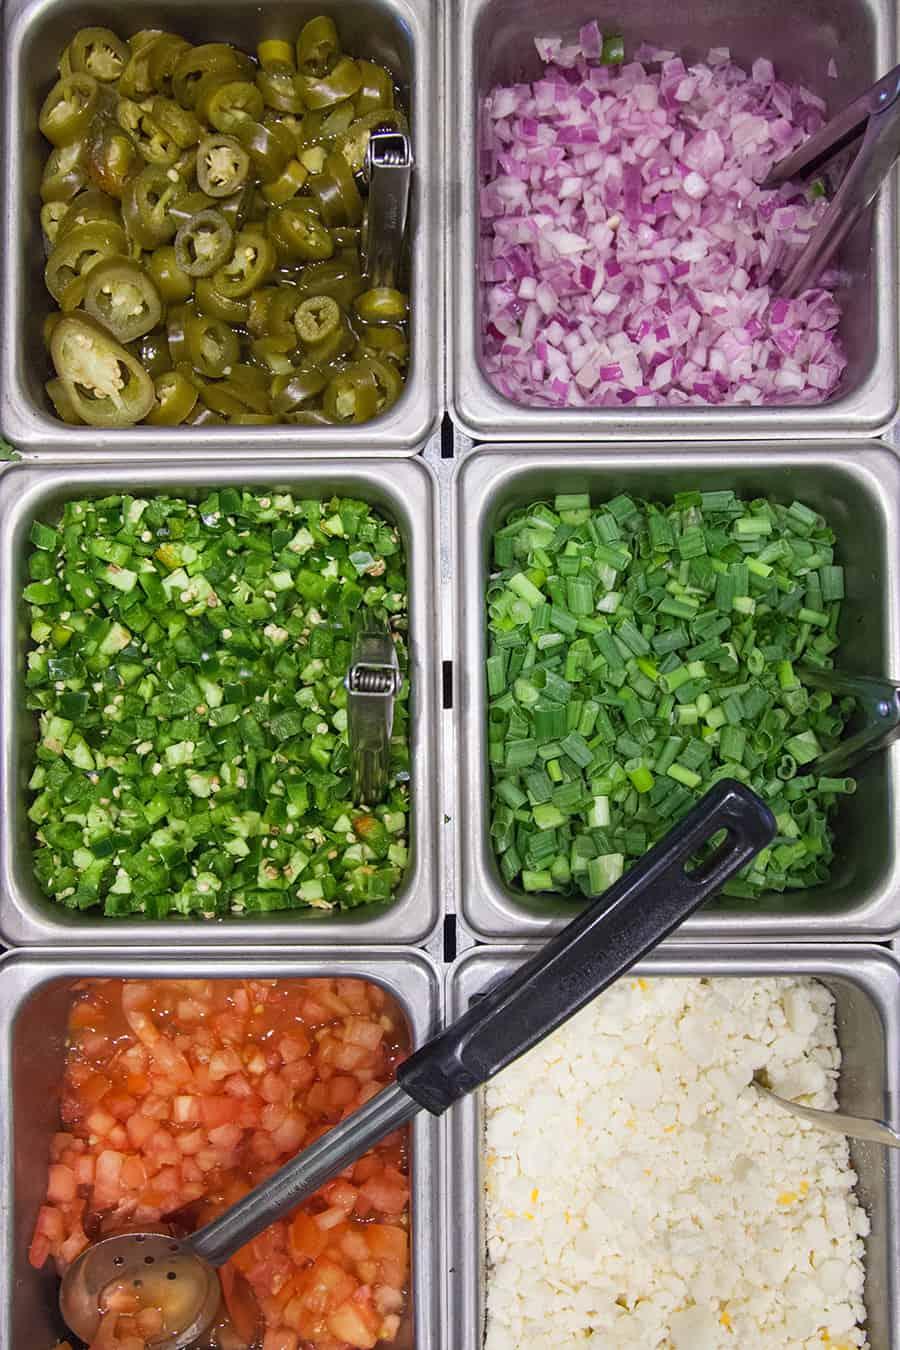 5-insane-burrito-recipes-try-3